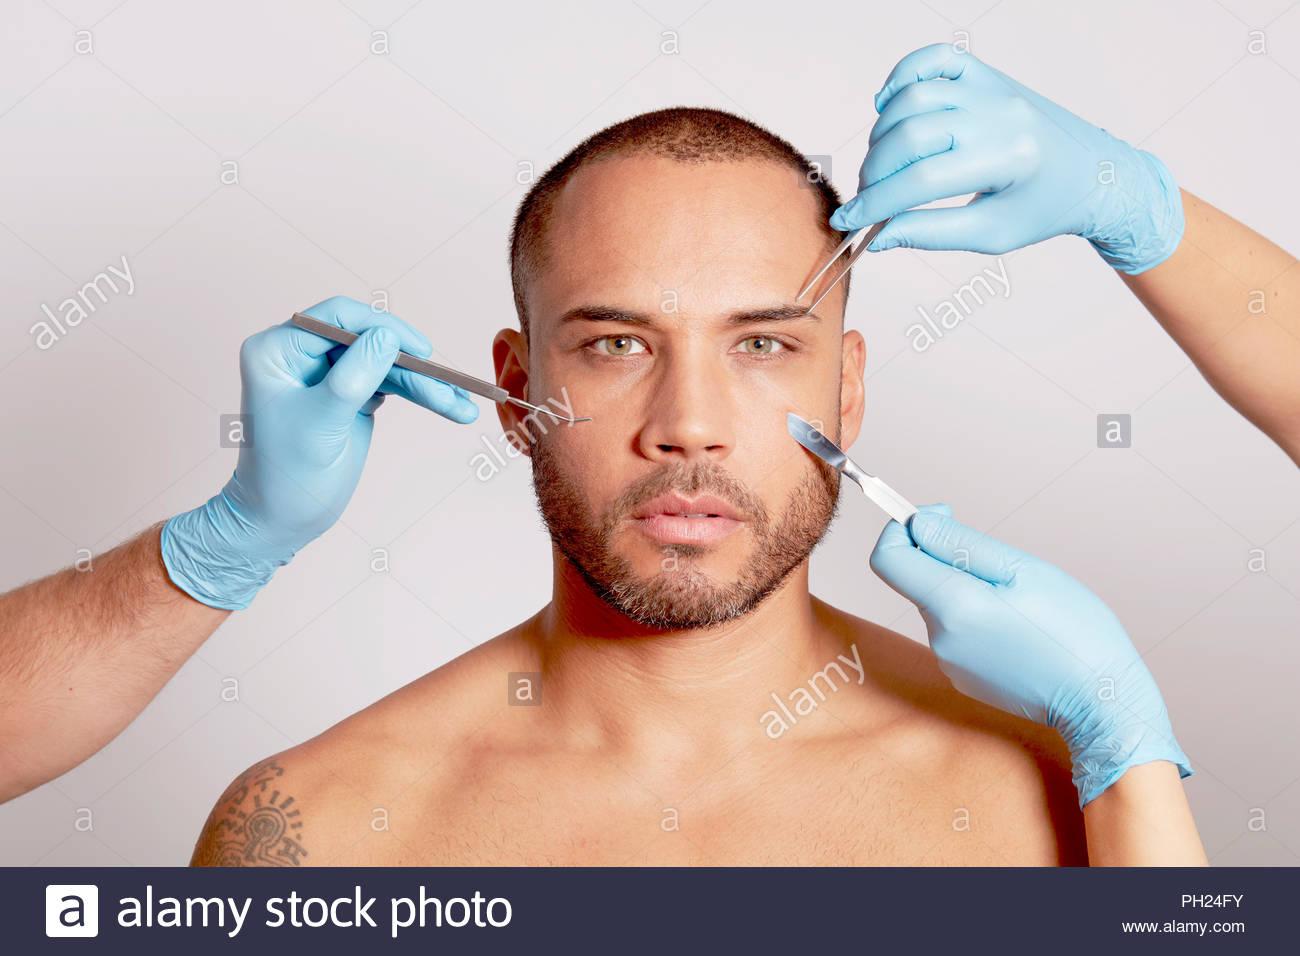 Mid adult man wearing moisturiser. - Stock Image